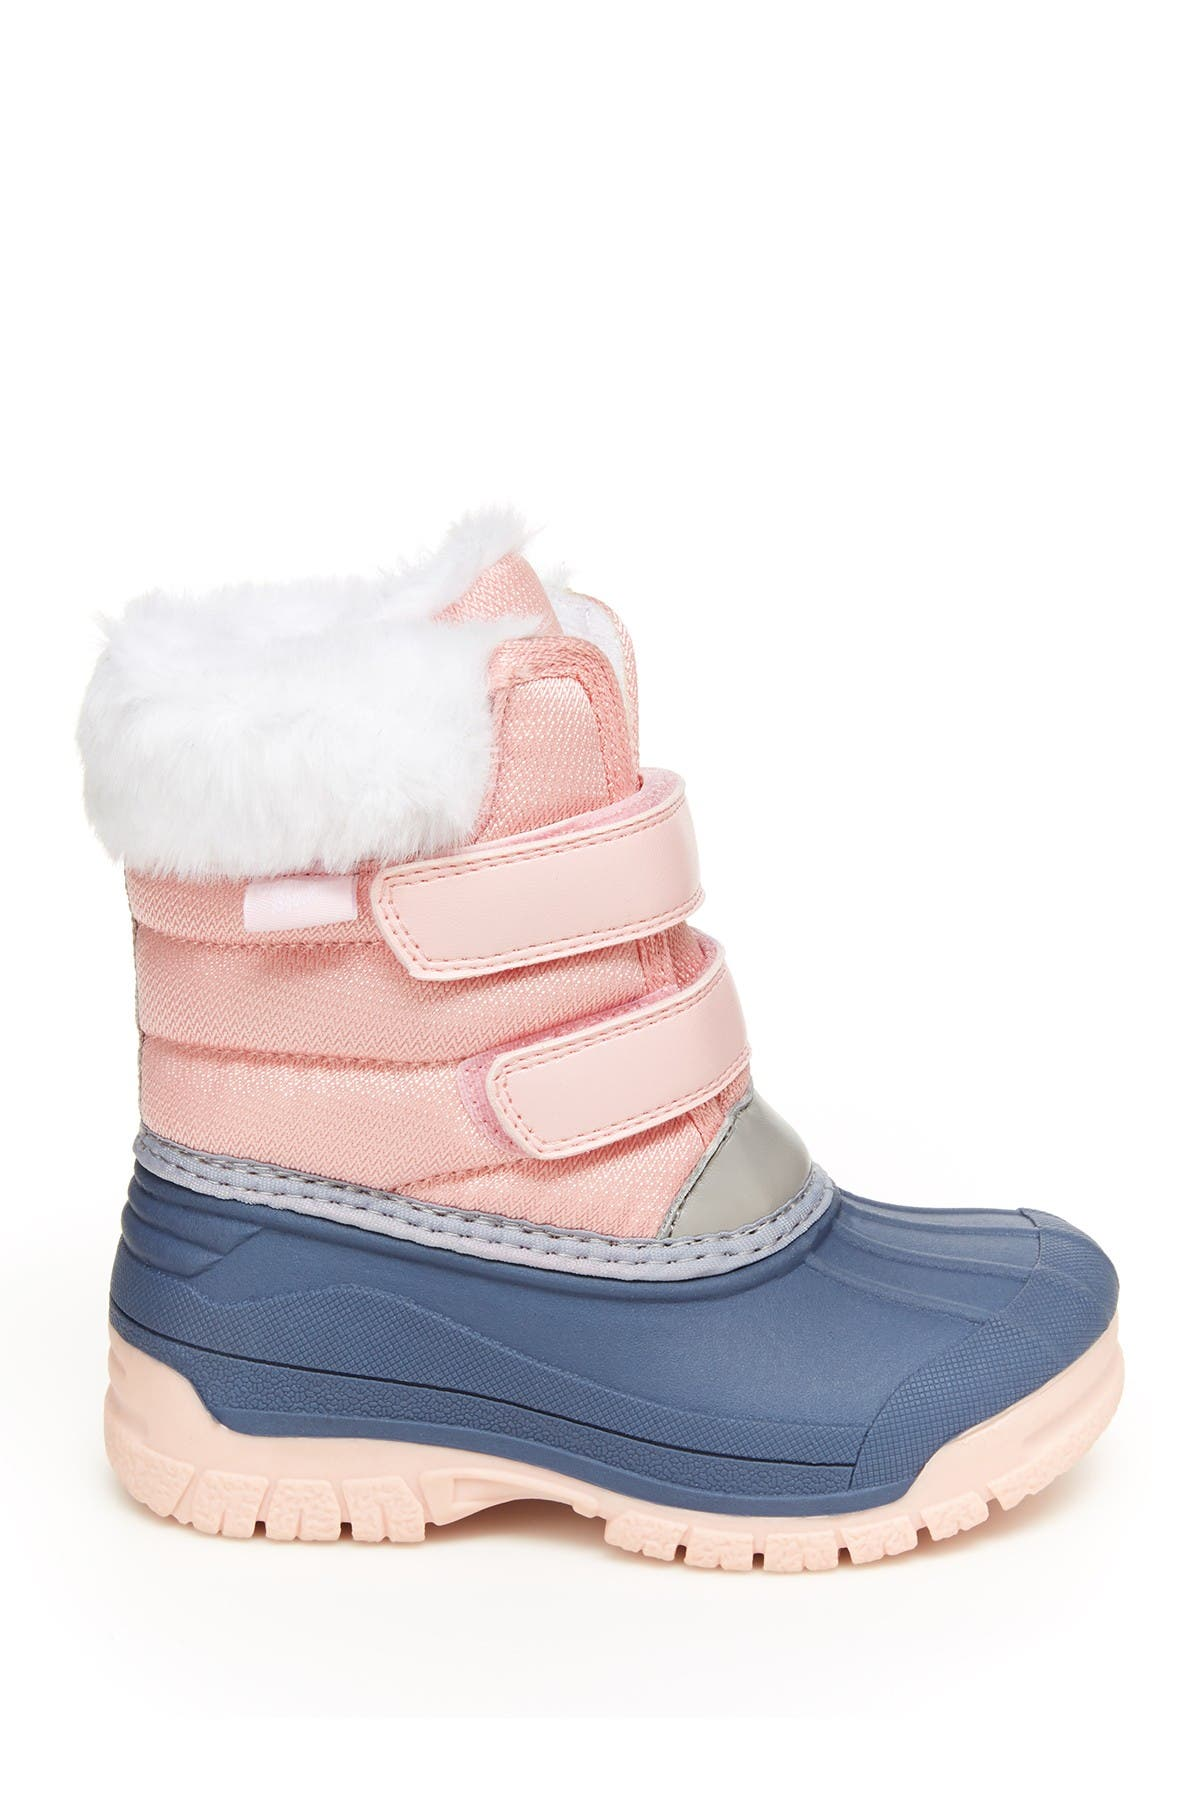 OshKosh Yule Faux Fur Trimmed Duck Boot